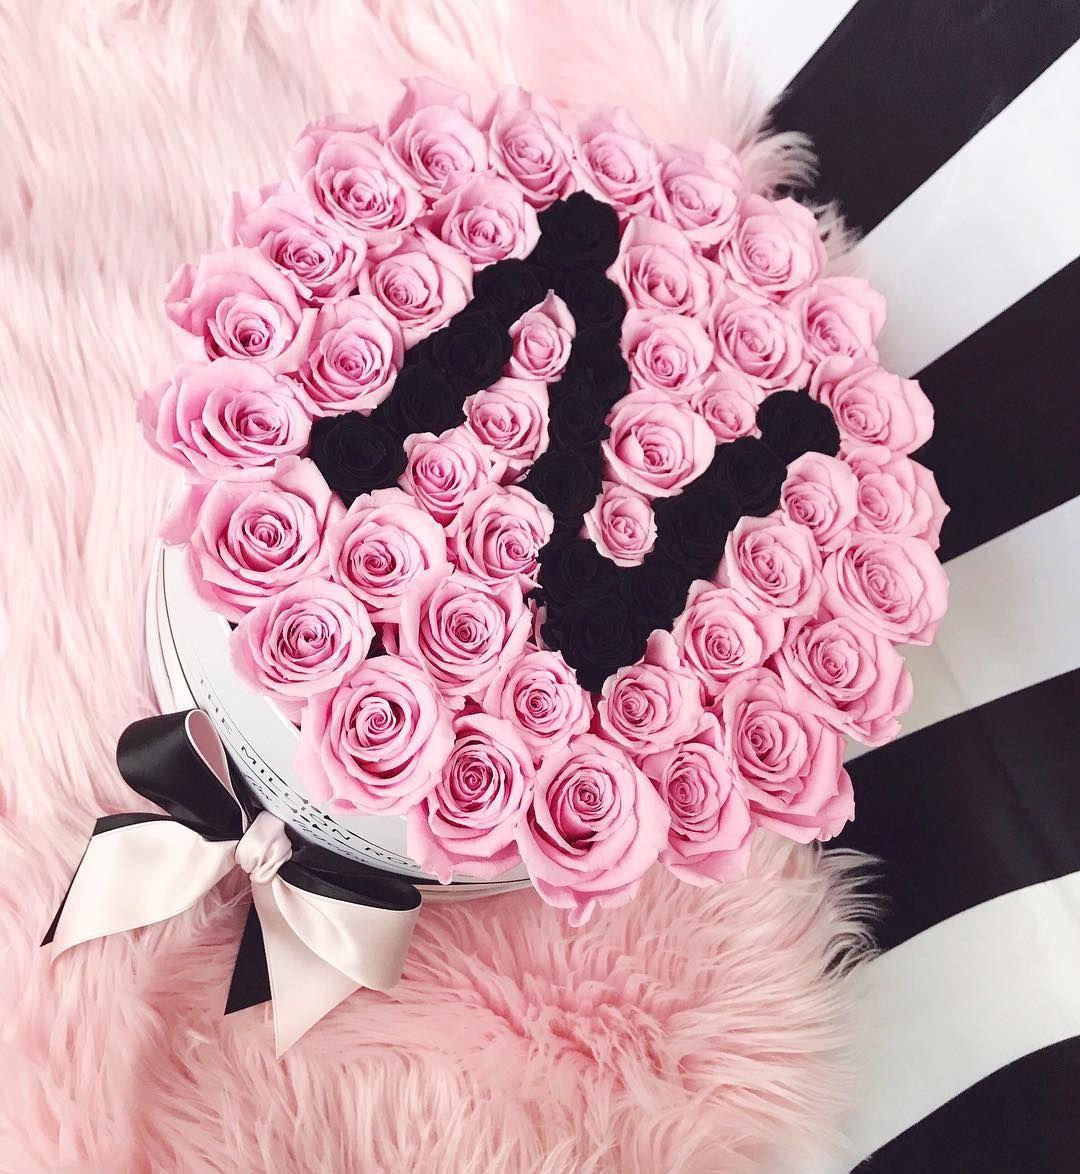 Gorgeous Customized Flowerbox Themillionroses Collection Design Style Blush Pink Black Roses Alphabet Tattoo Designs Flower Boxes Stylish Alphabets